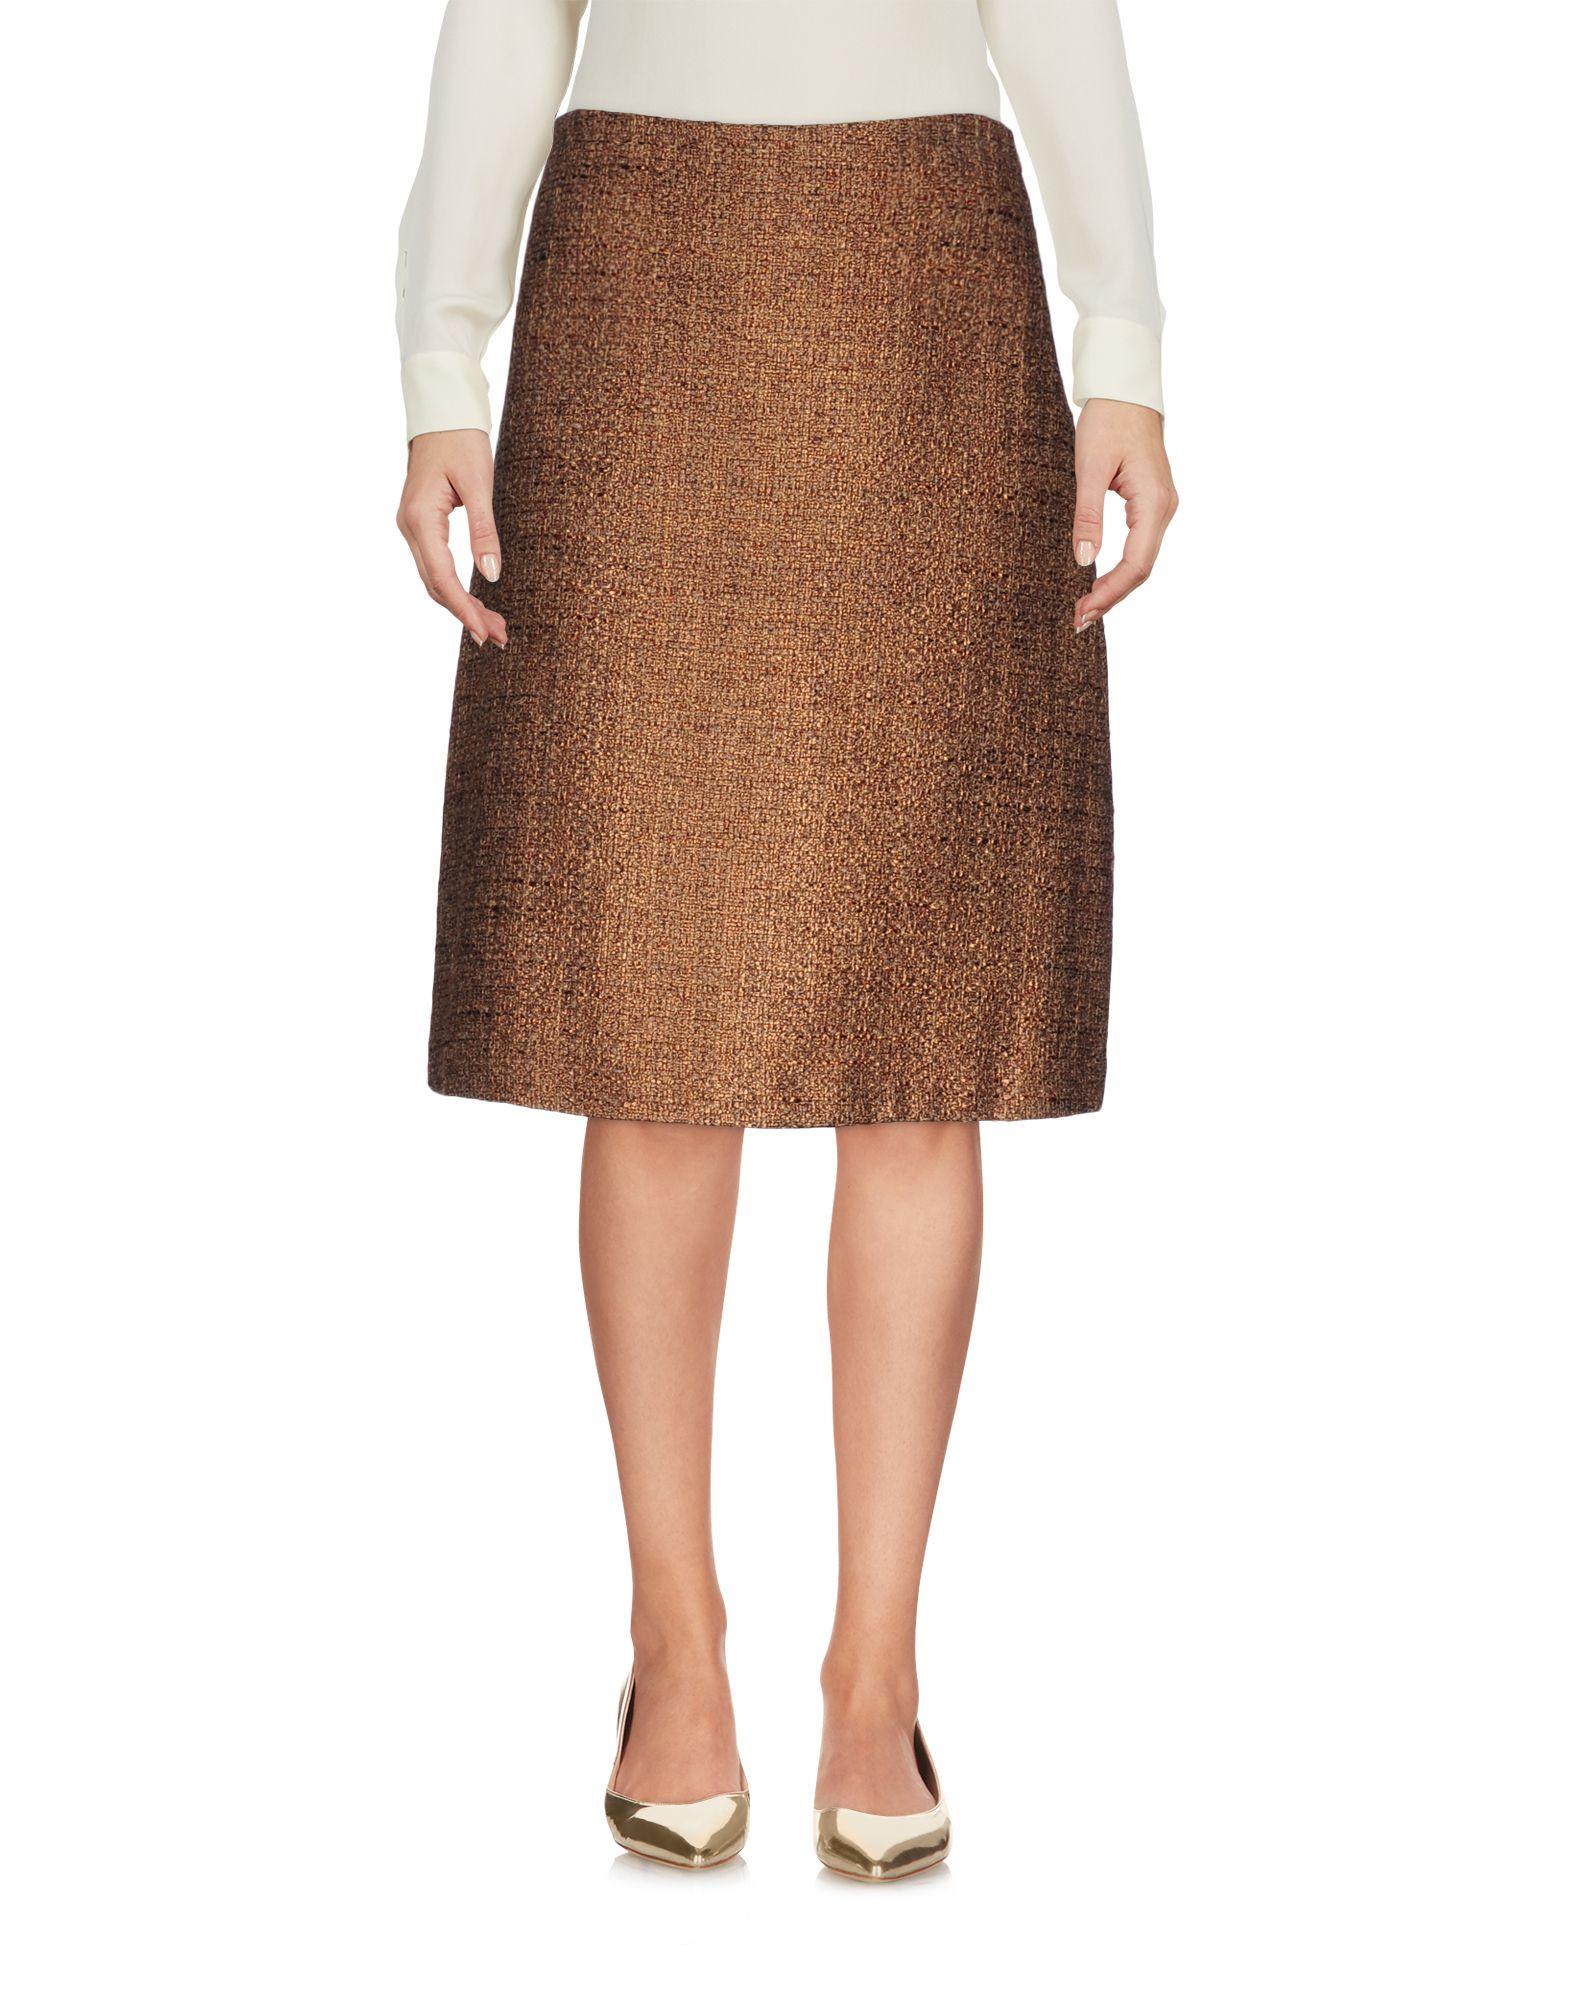 LAURA URBINATI Knee Length Skirt in Khaki